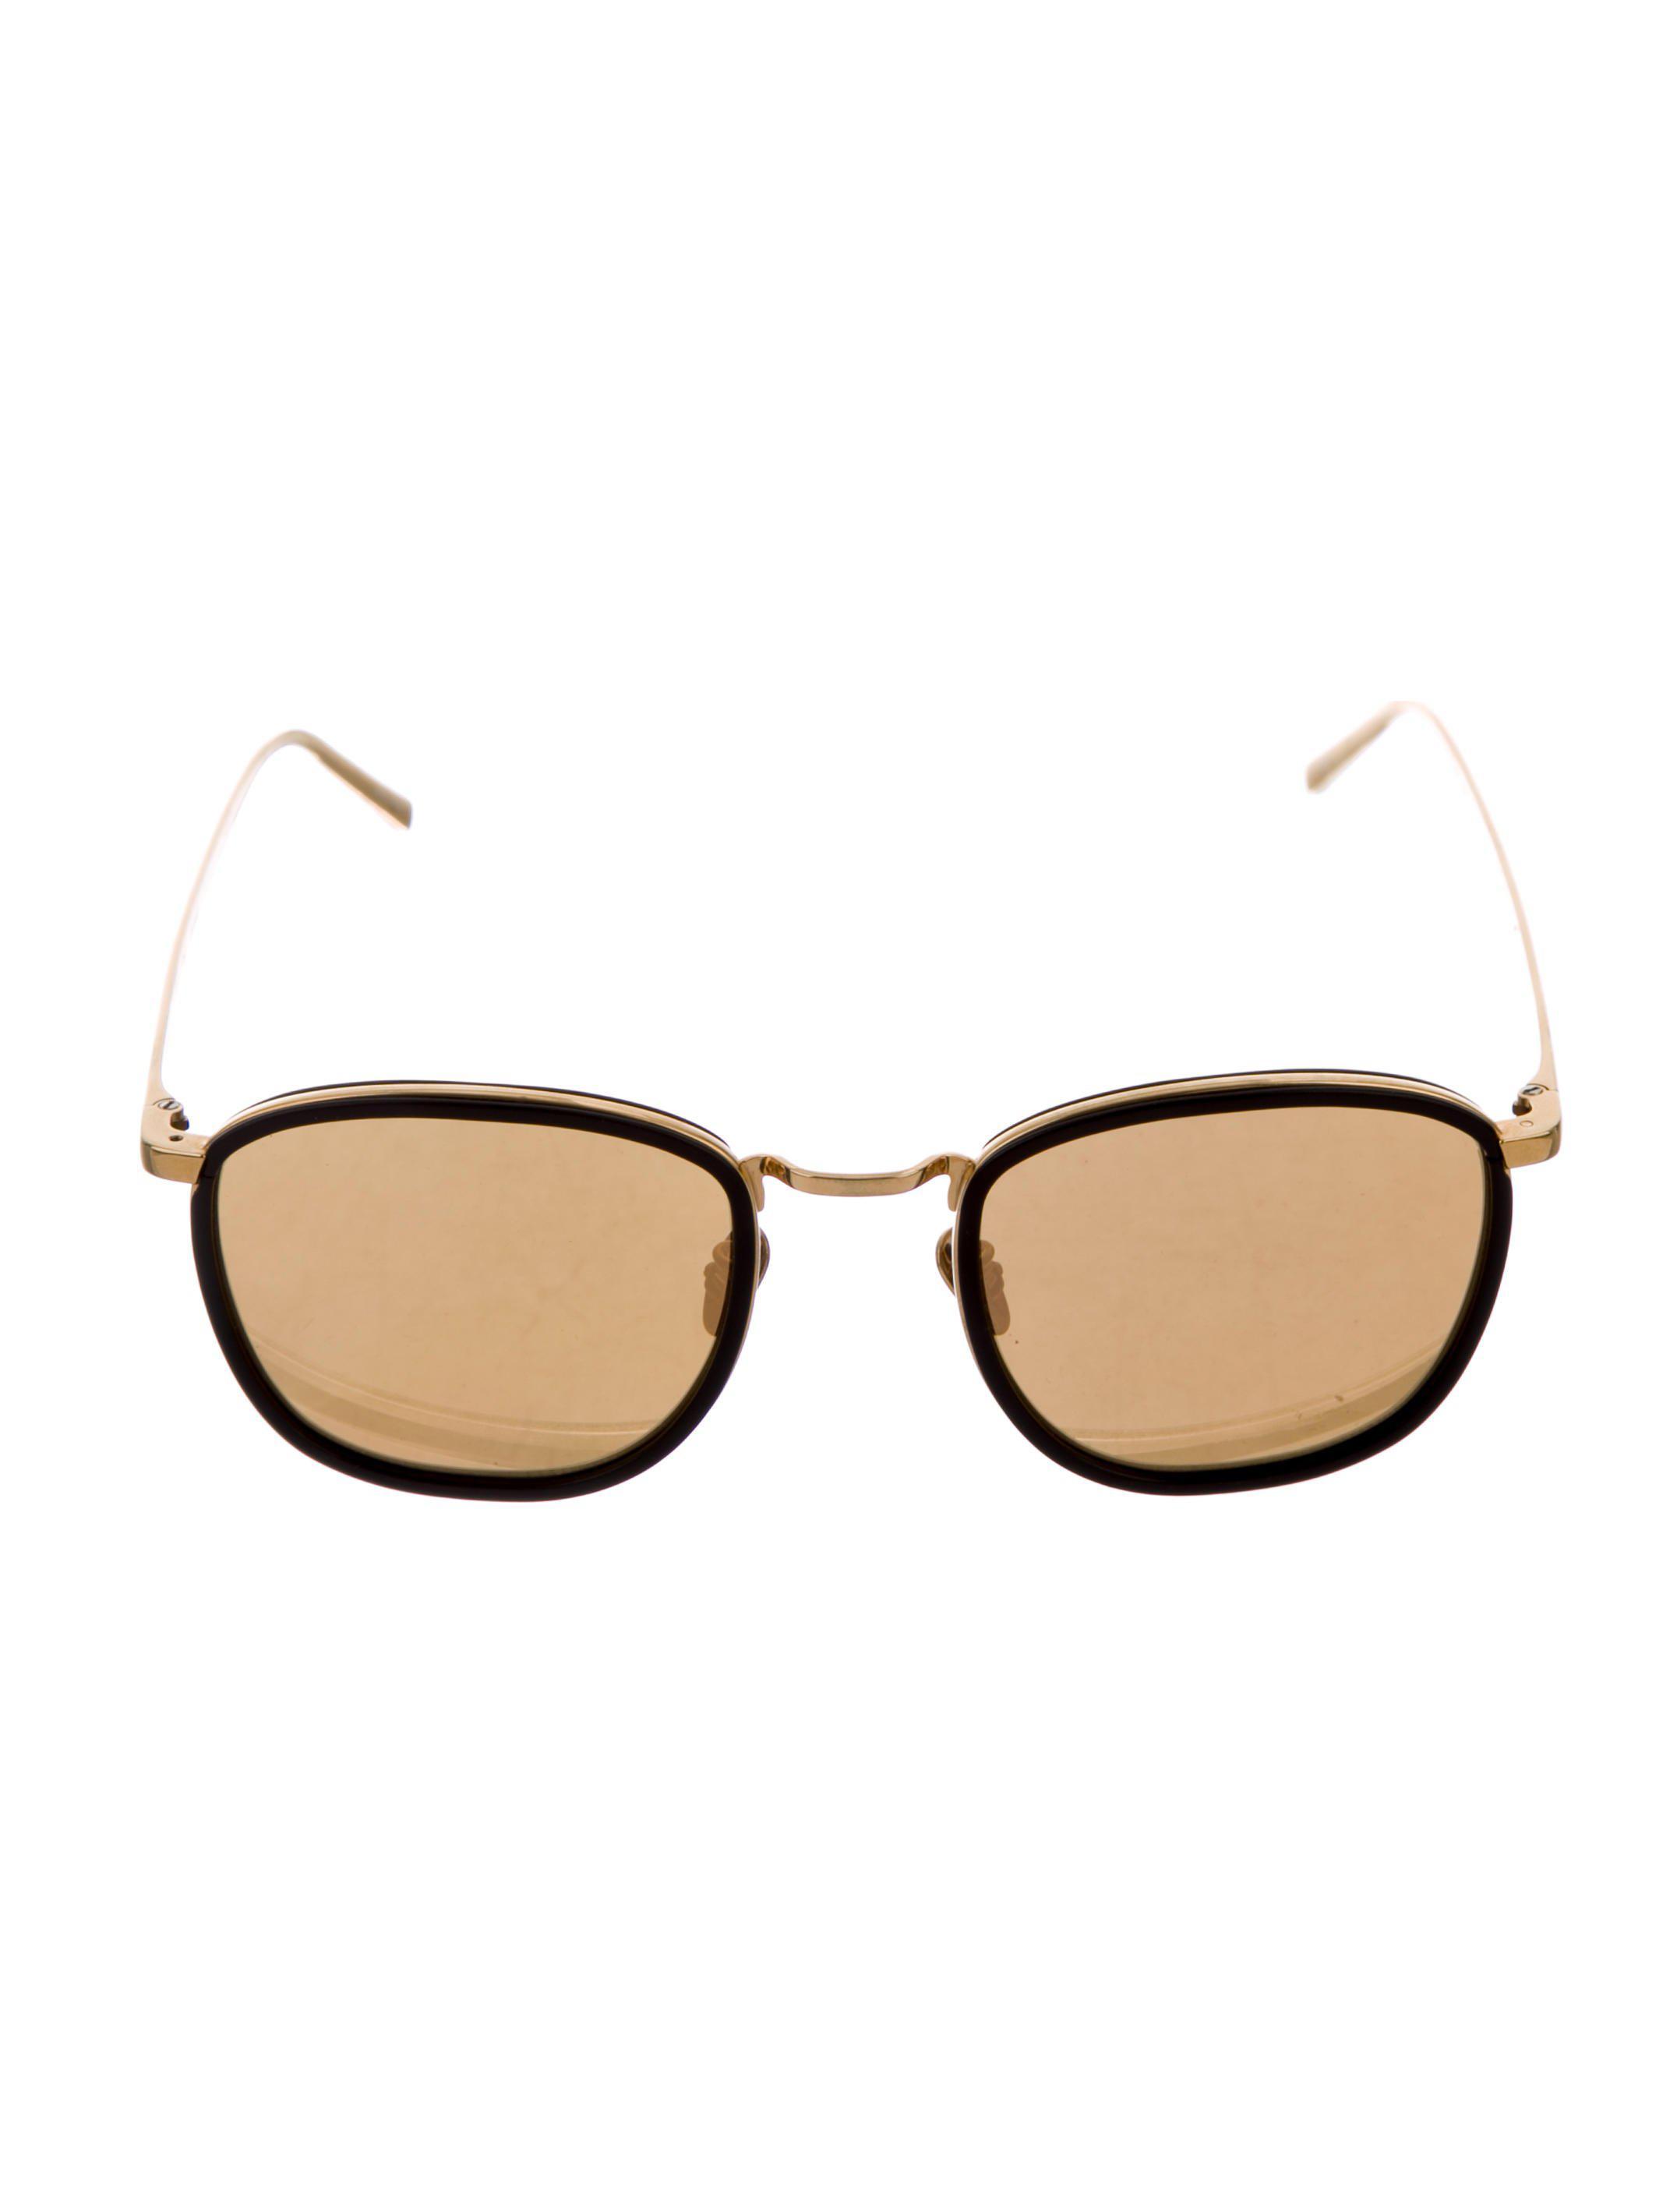 9cda6bc9530b Lyst - Linda Farrow Metal Mirror Sunglasses Gold in Metallic